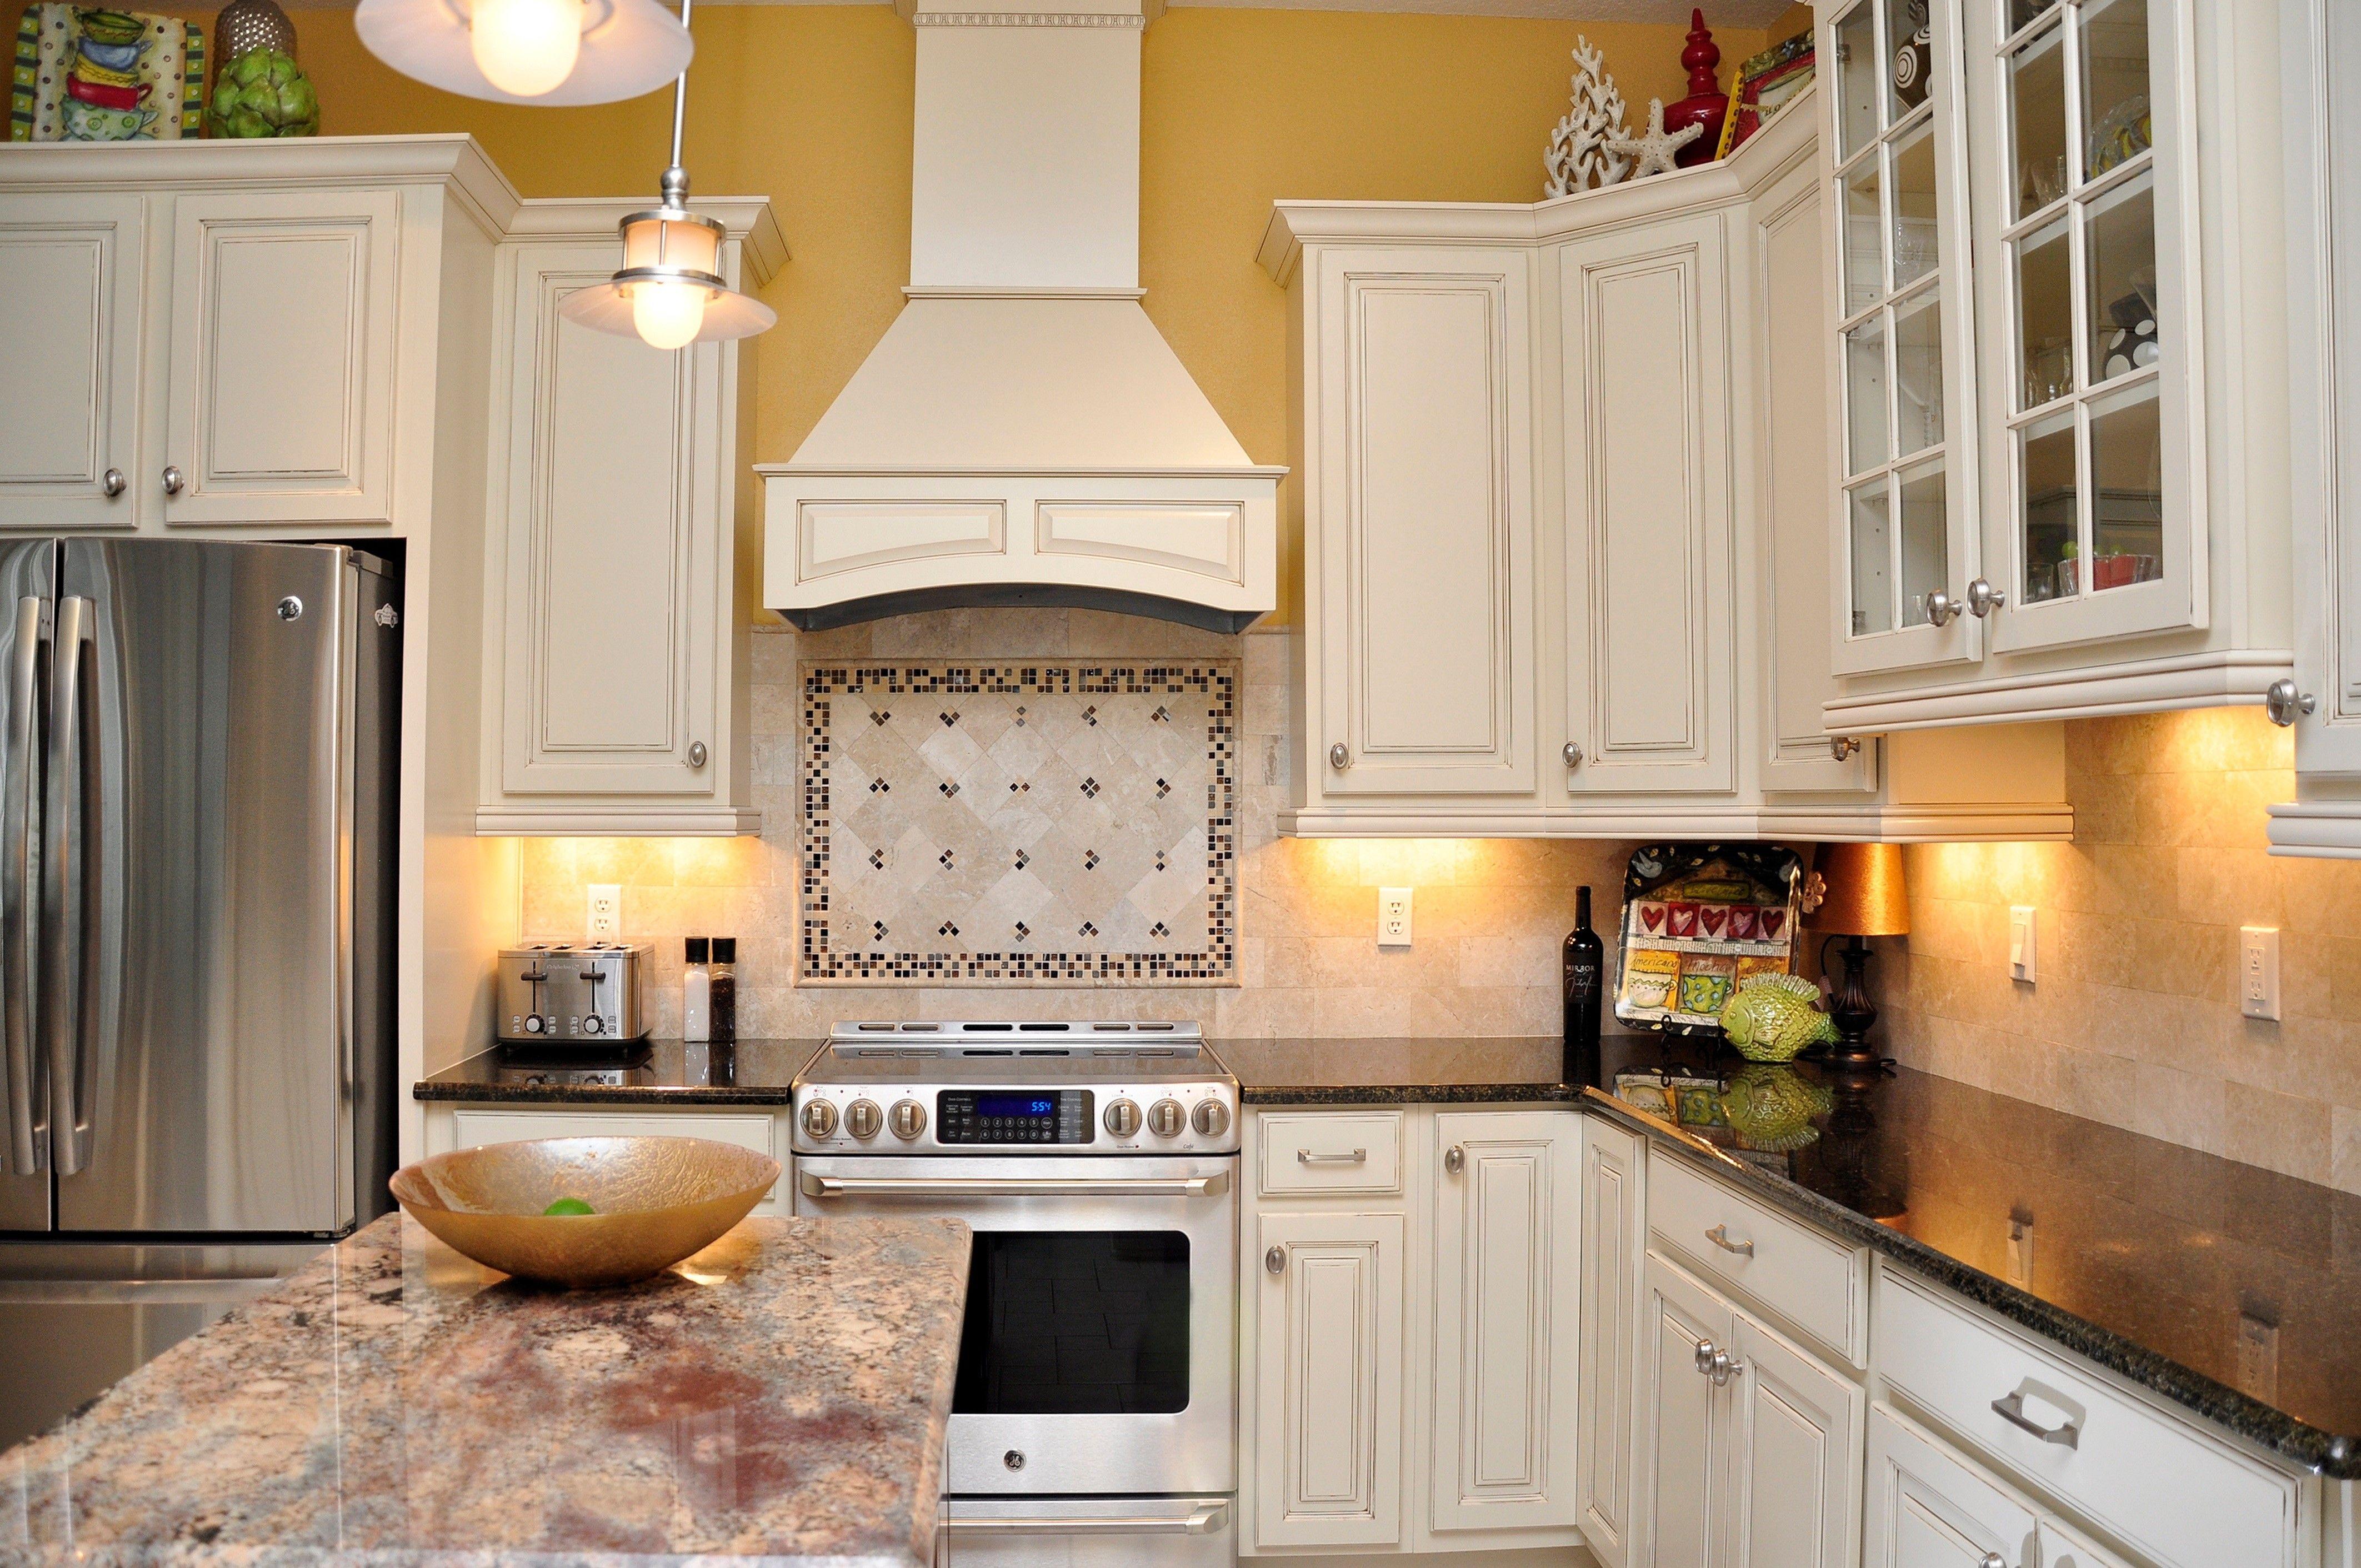 Yellow Kitchen Appliances Black Faucet White Cabinets Dark Granite Stainless Steel